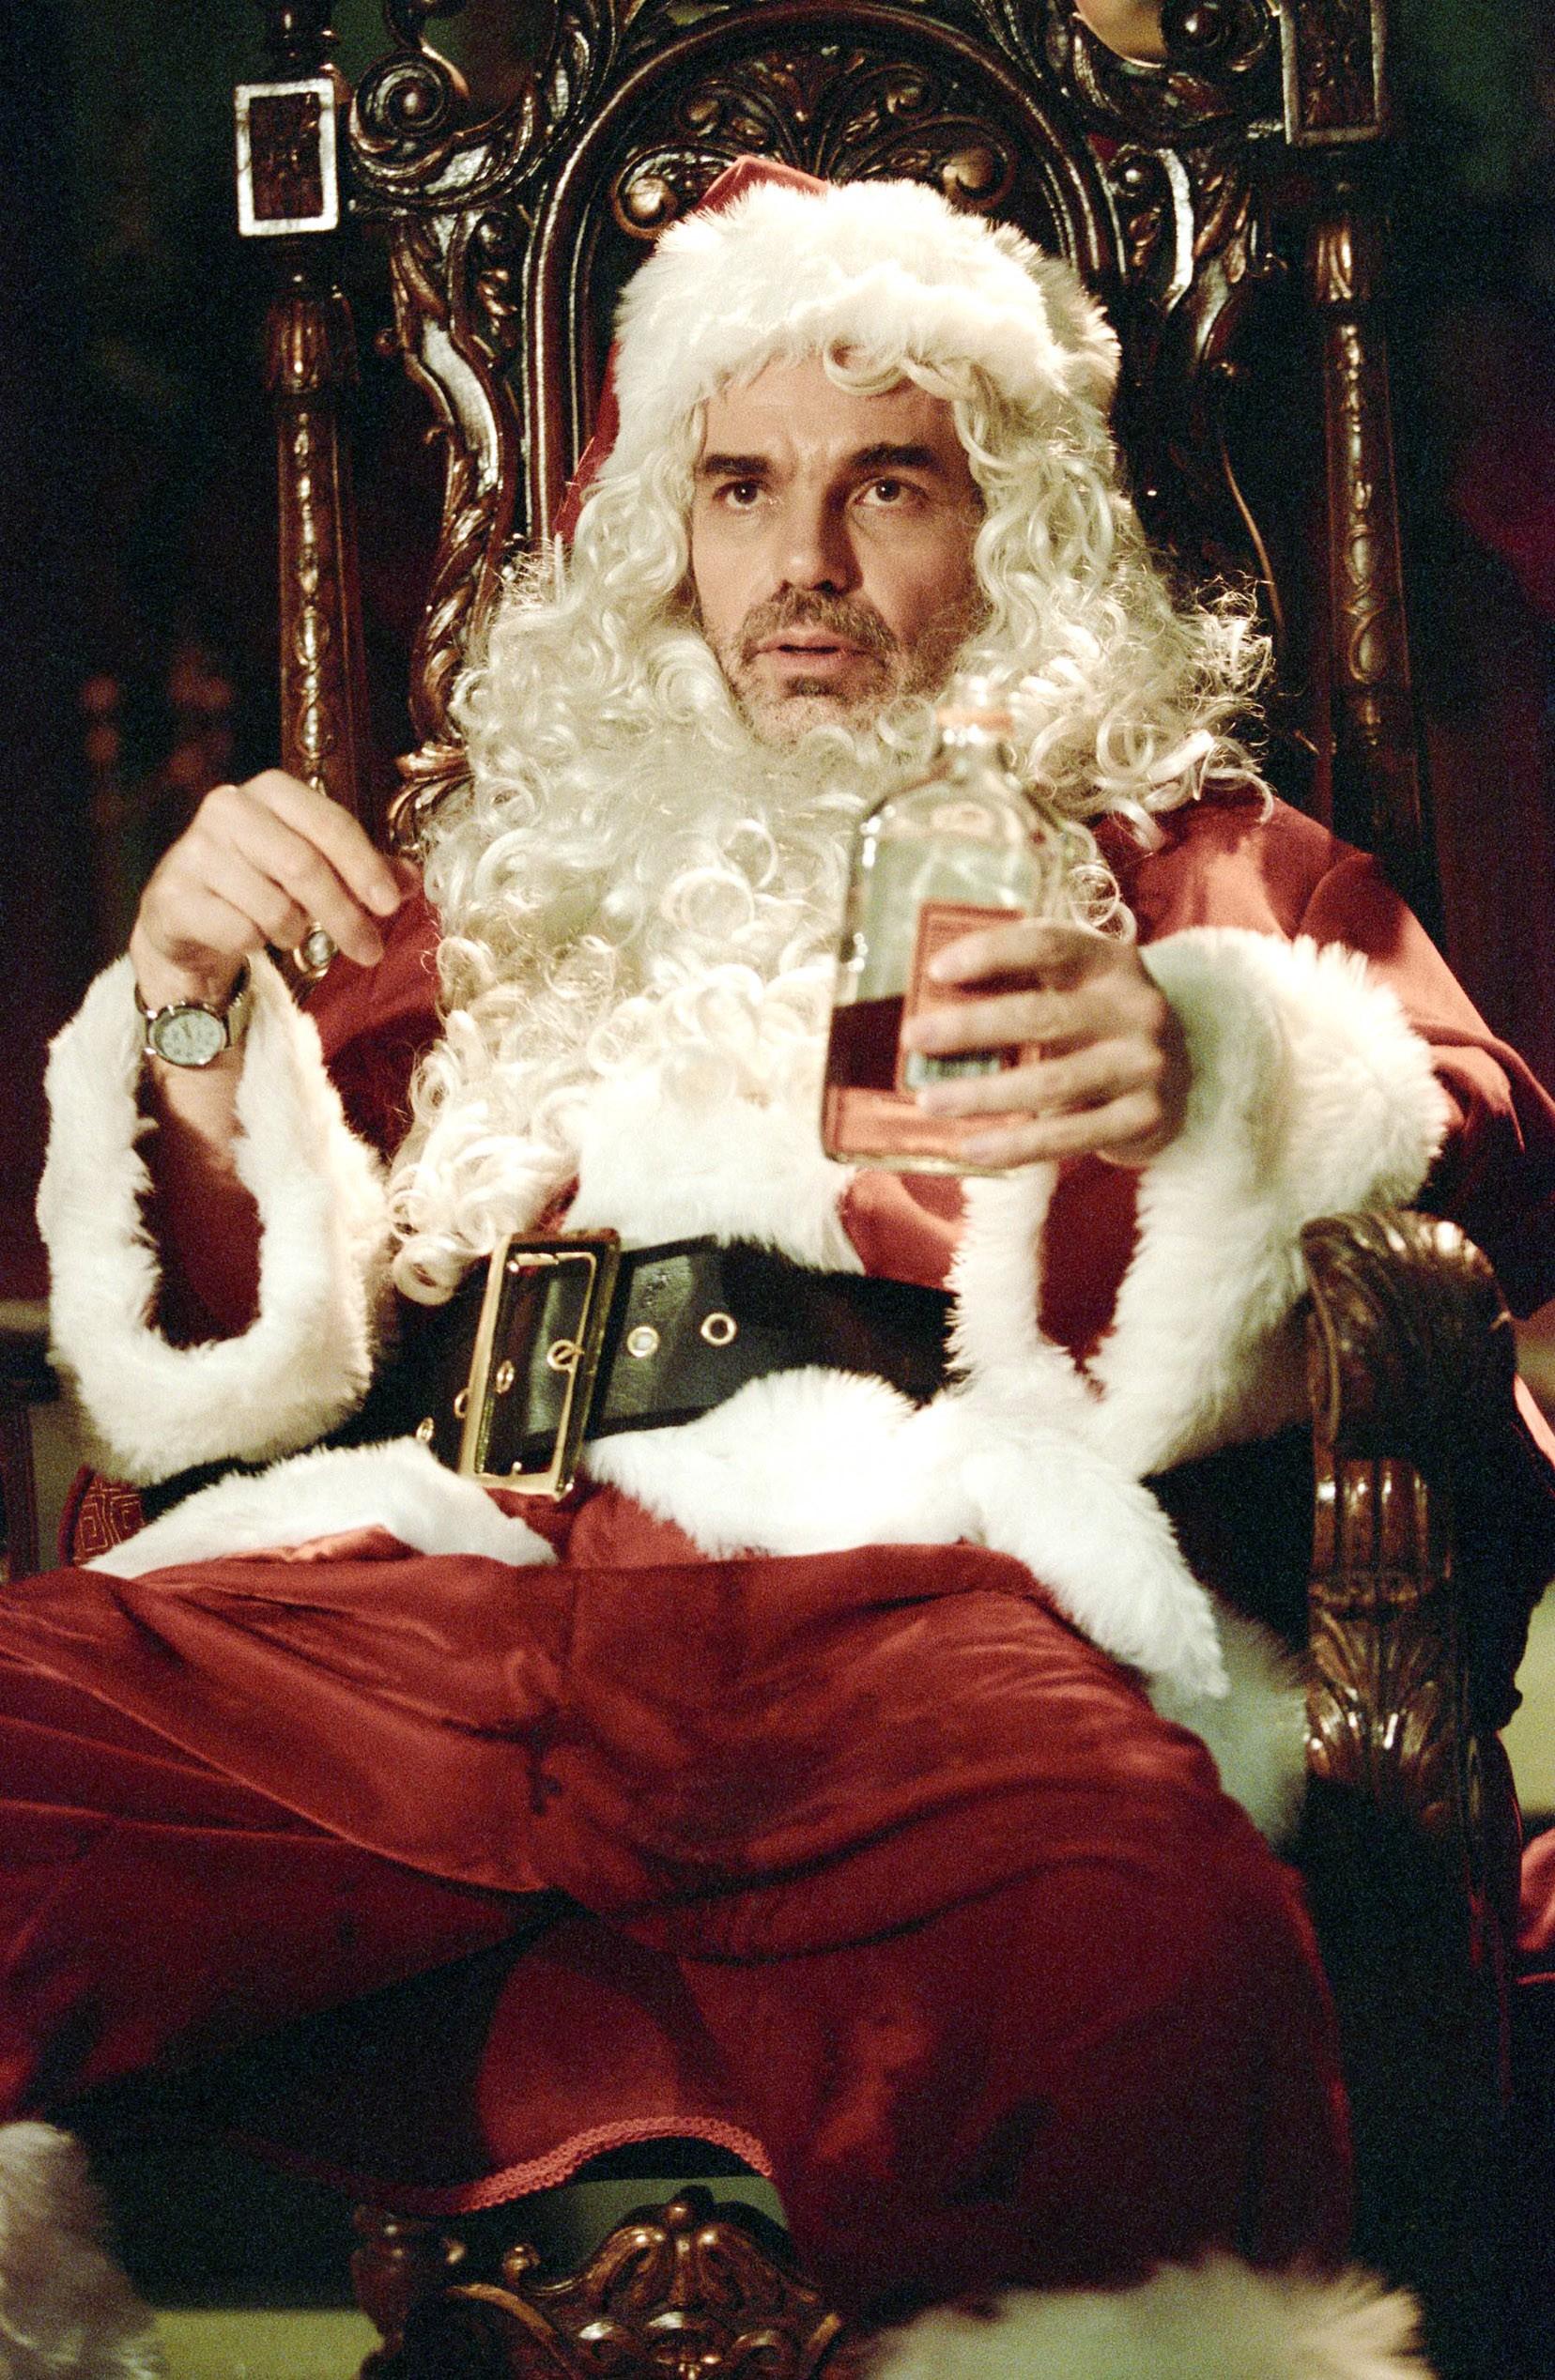 Billy Bob Thornton Dusting Off Fake Beard For Bad Santa 2